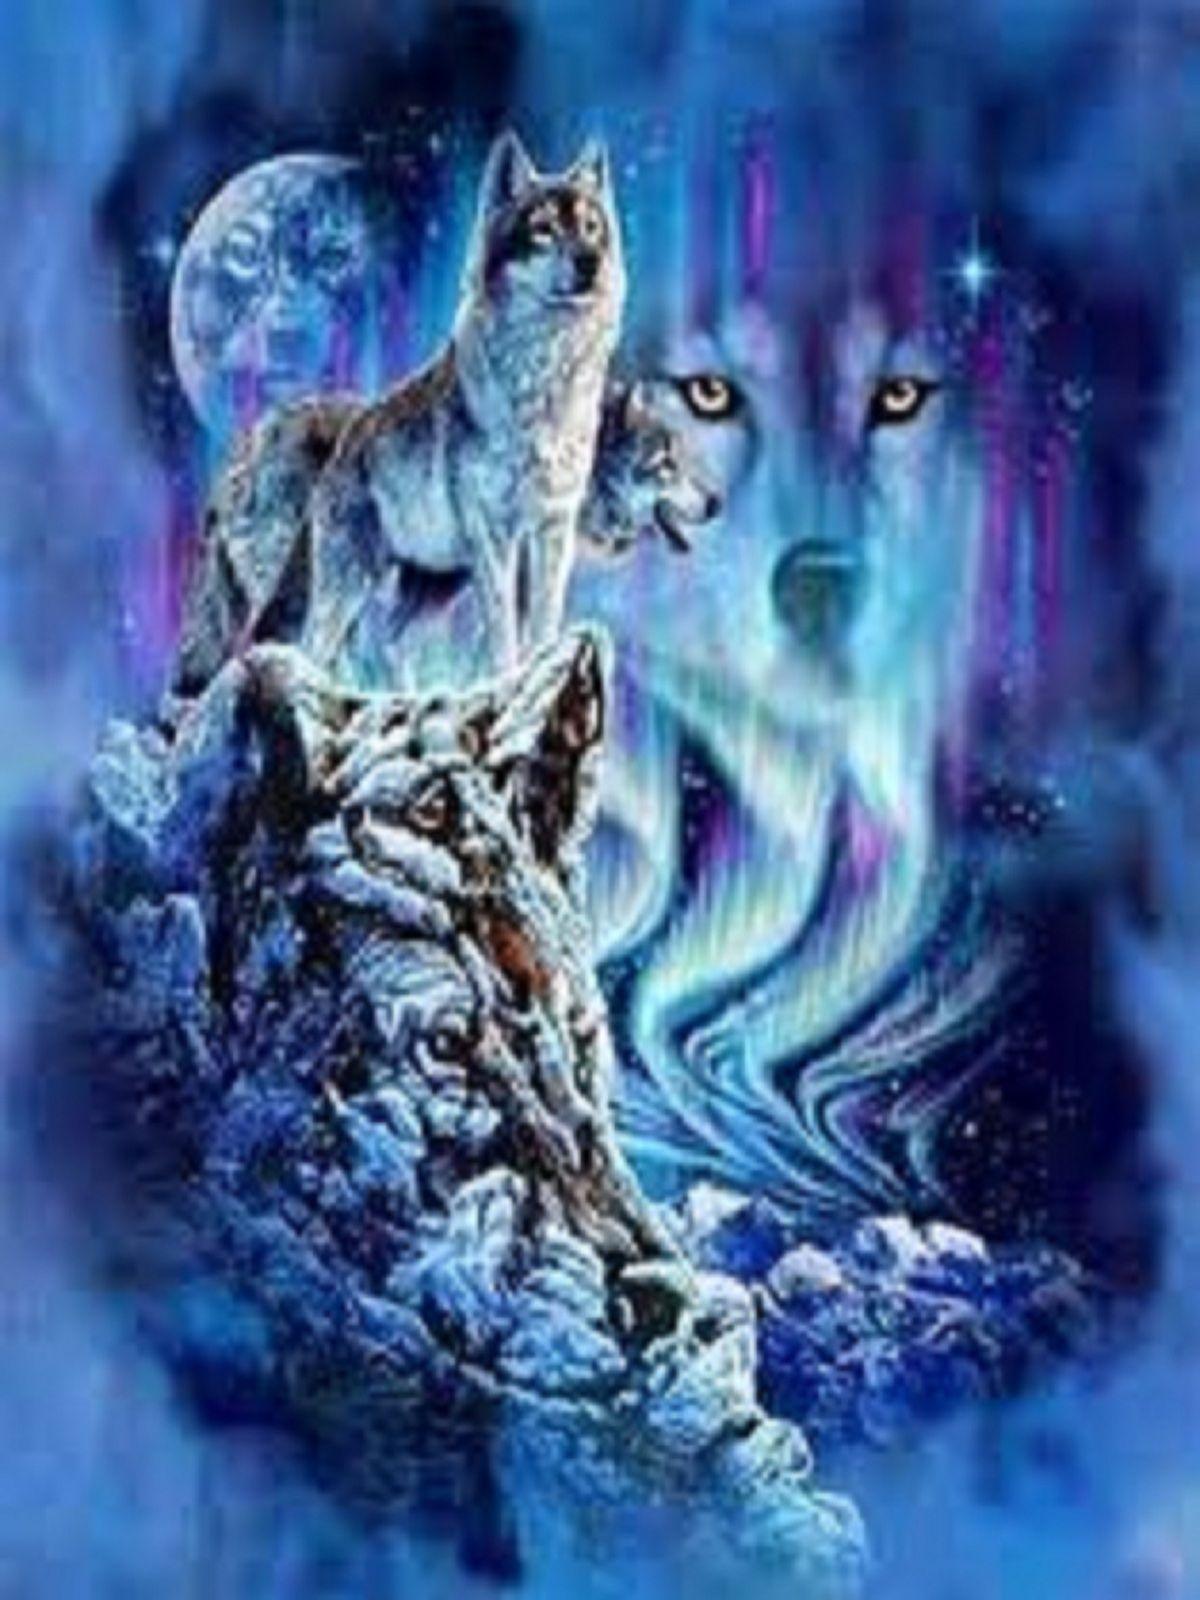 Blue Spirit Wolf Wallpapers Top Free Blue Spirit Wolf